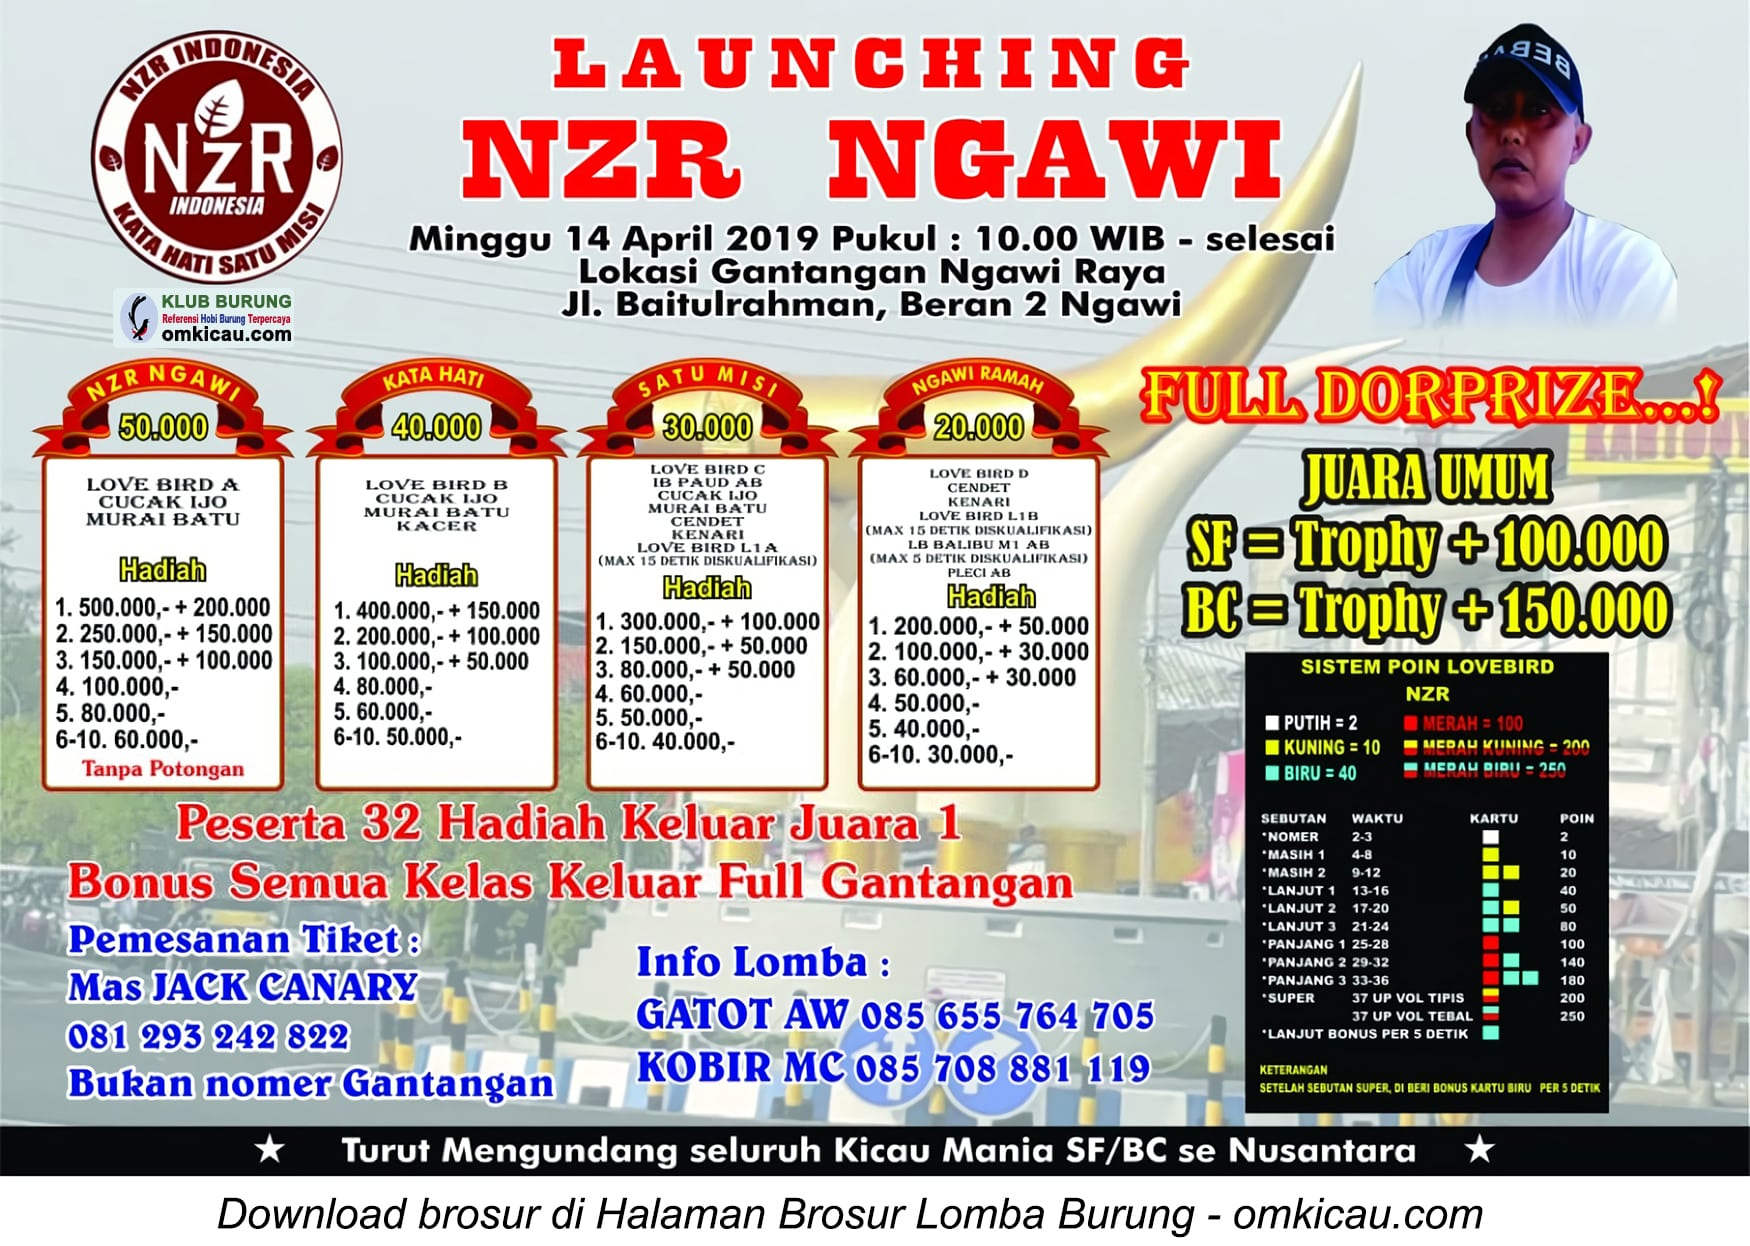 Launching NZR Ngawi